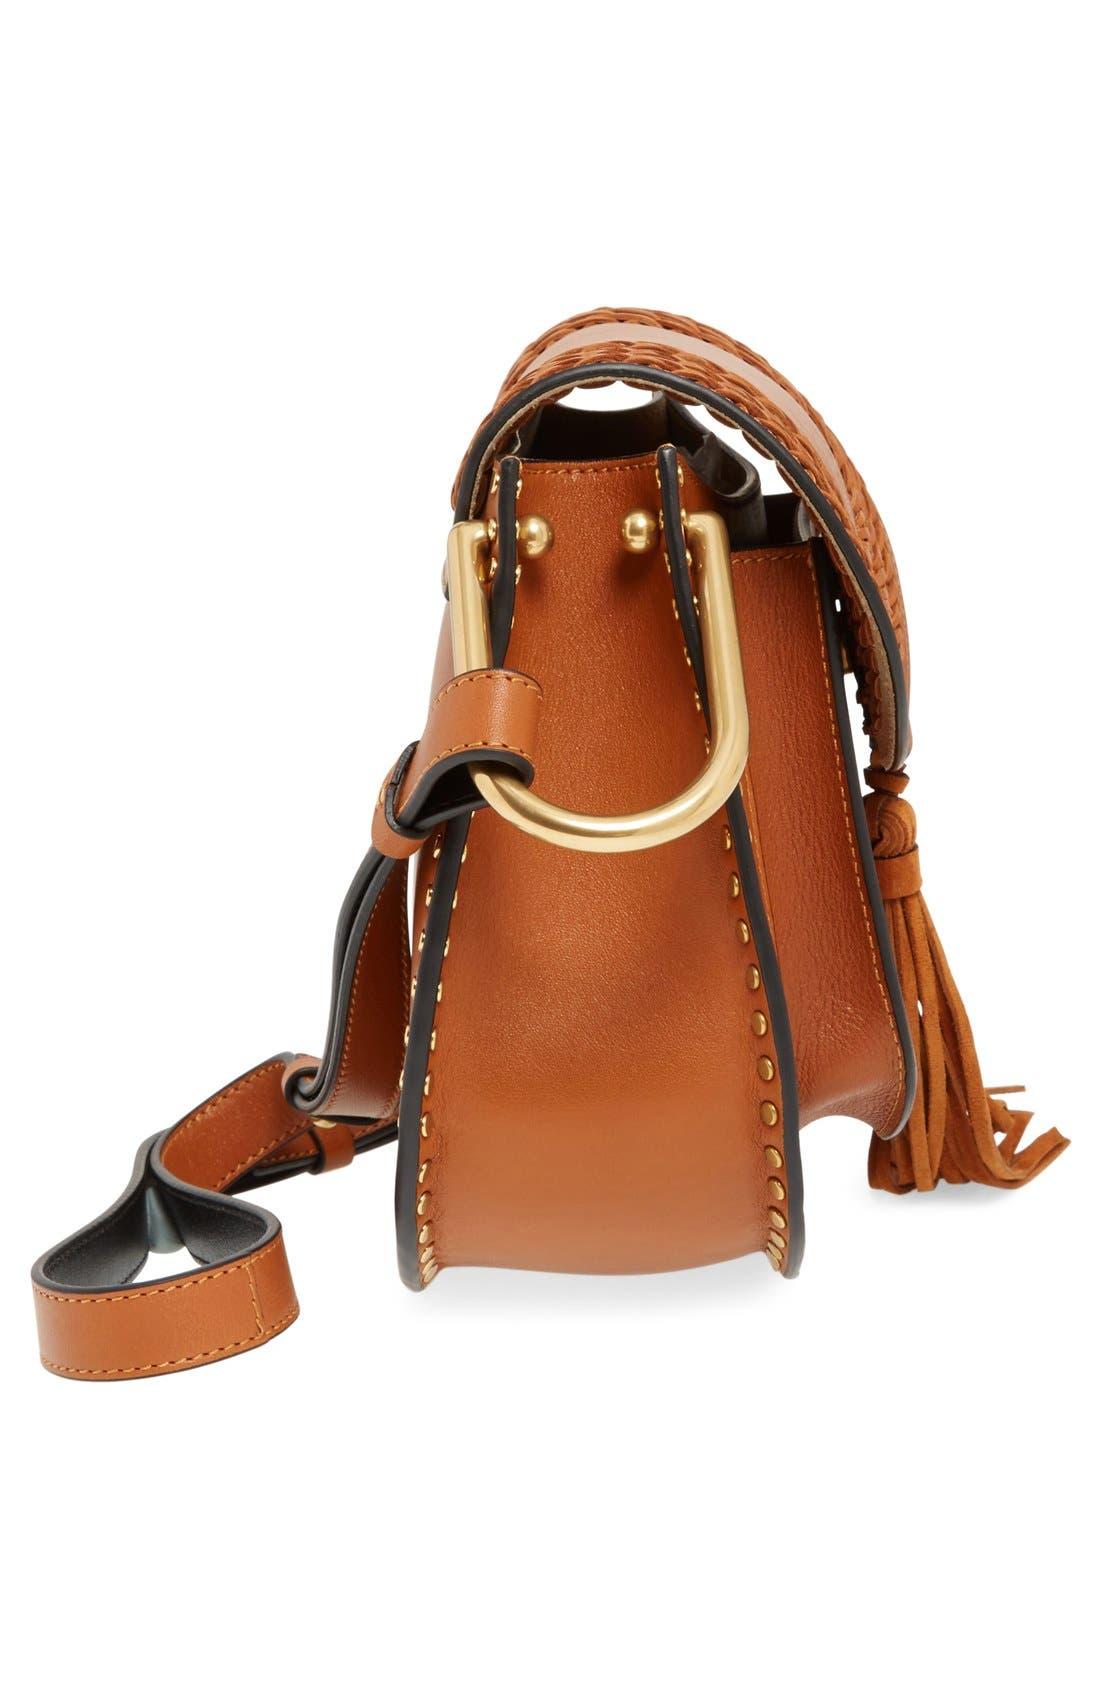 'Small Hudson' Studded Calfskin Leather Crossbody Bag,                             Alternate thumbnail 6, color,                             Caramel